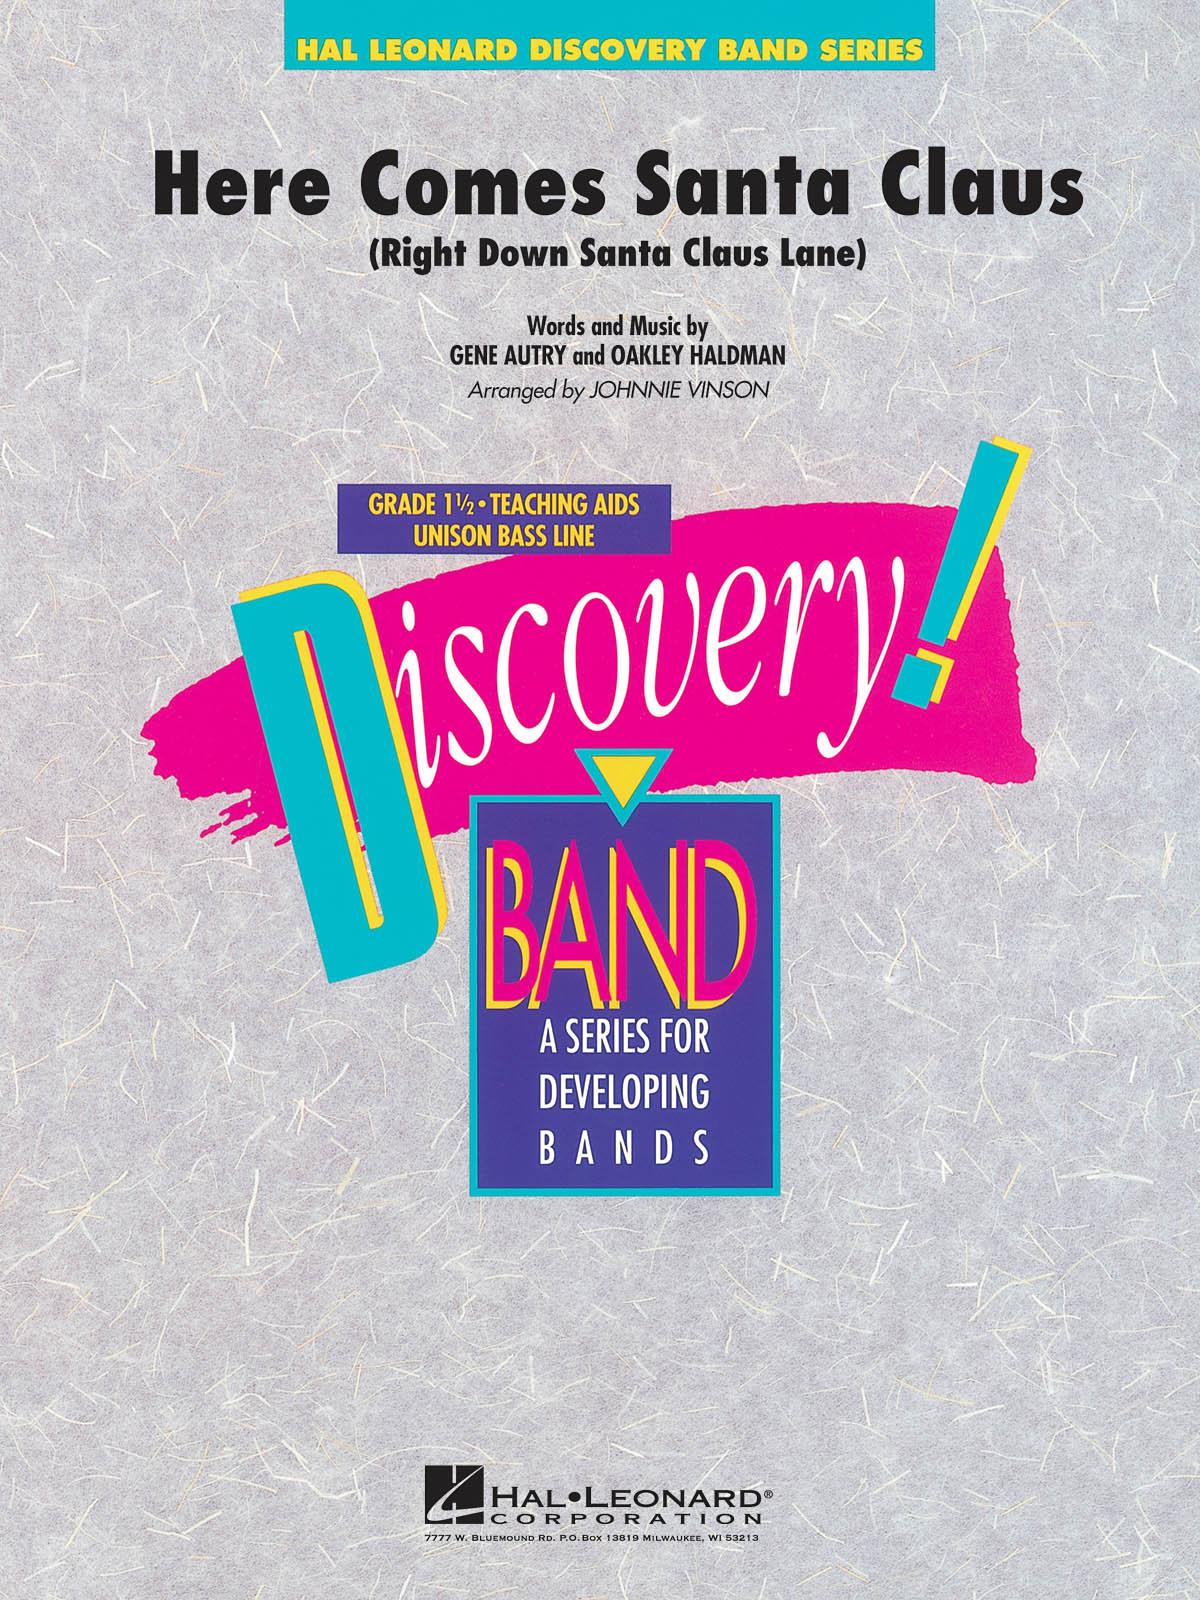 Here Comes Santa Claus: Concert Band: Score